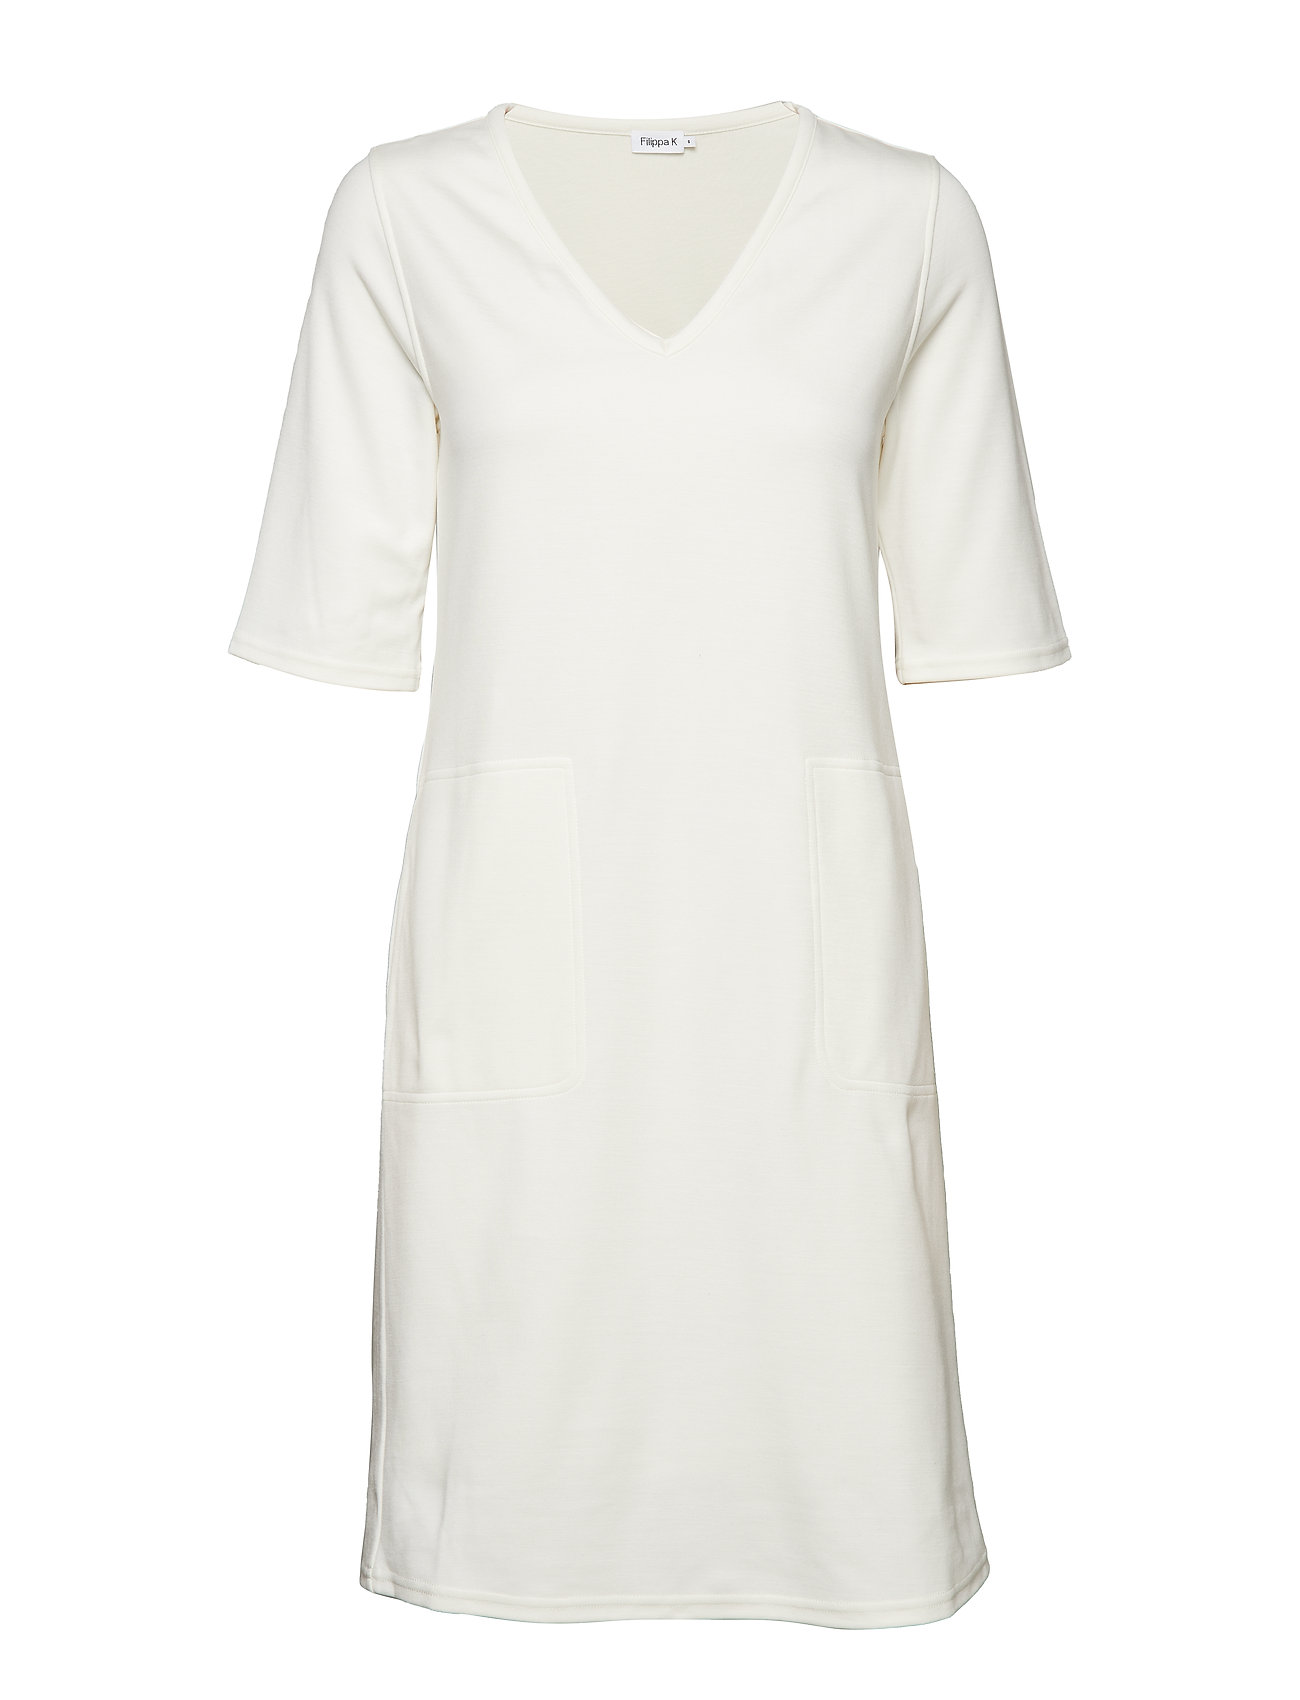 T Dressoff K Double shirt Face WhiteFilippa L5cRq34Aj